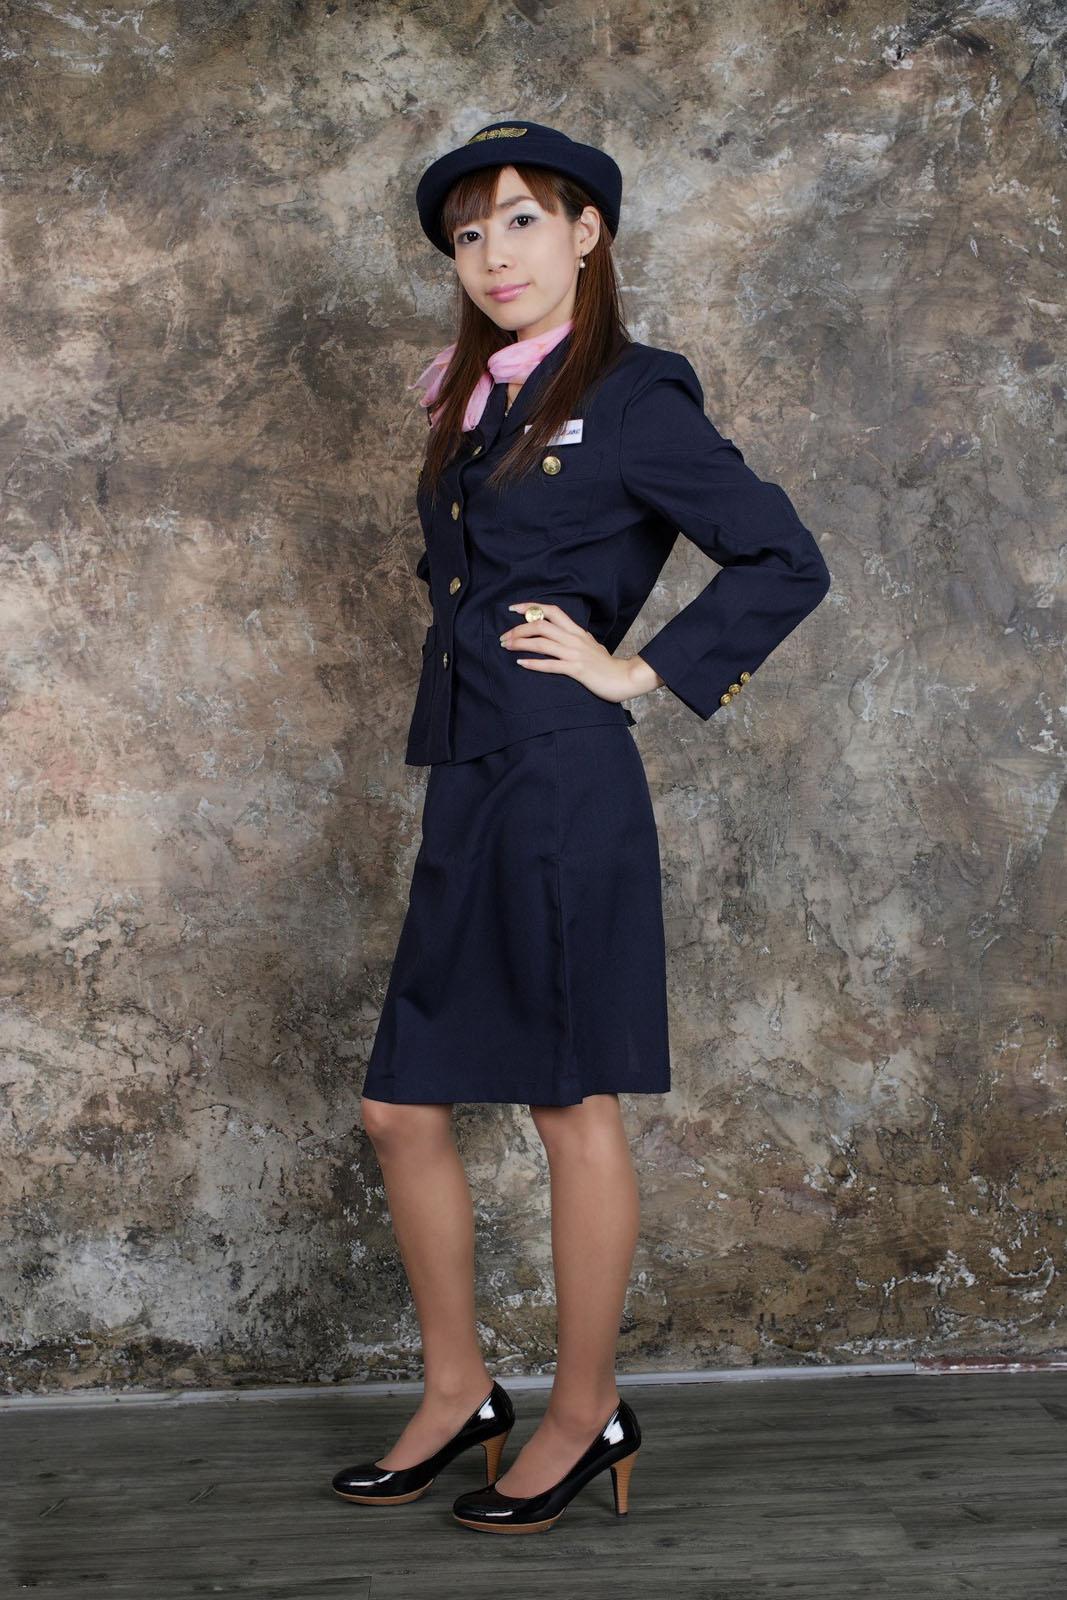 Asian Stewardess  Hot Girl Hd Wallpaper-2725